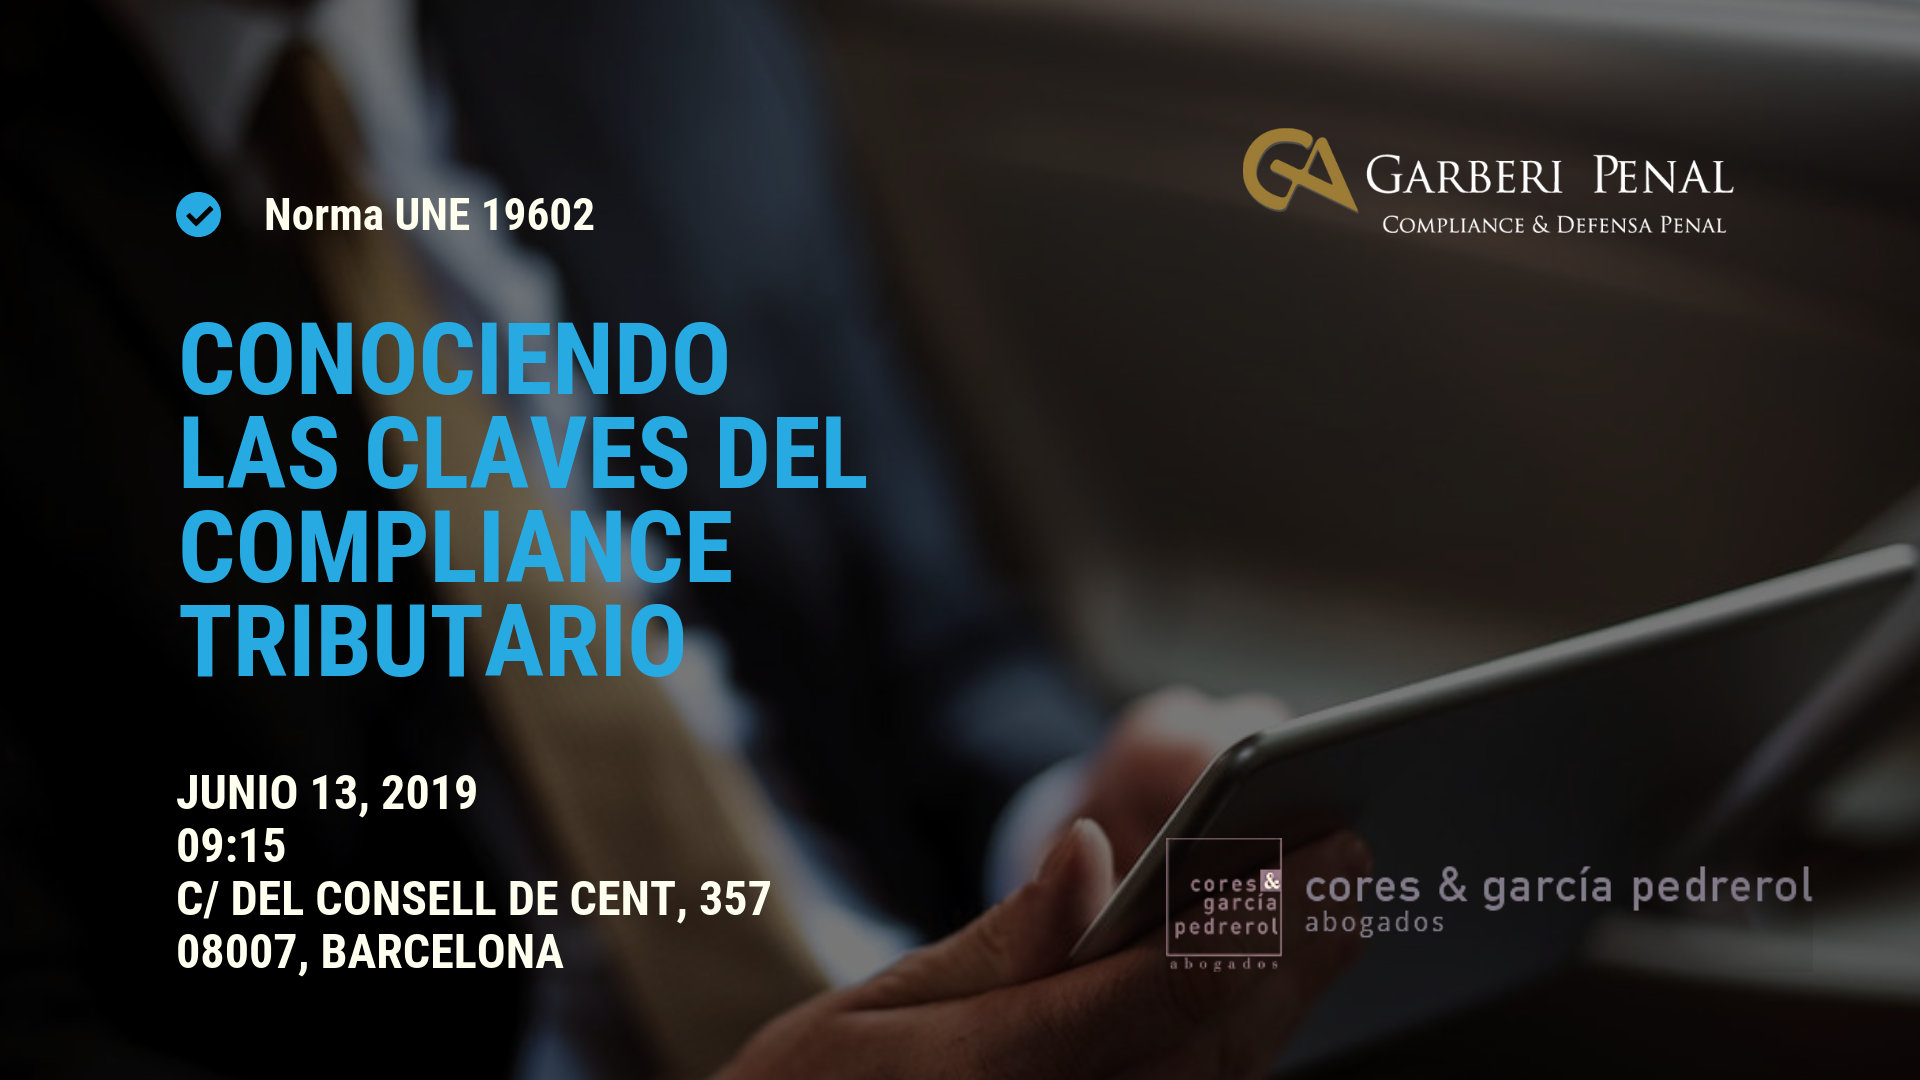 Norma UNe 19602 Compliance Tributario